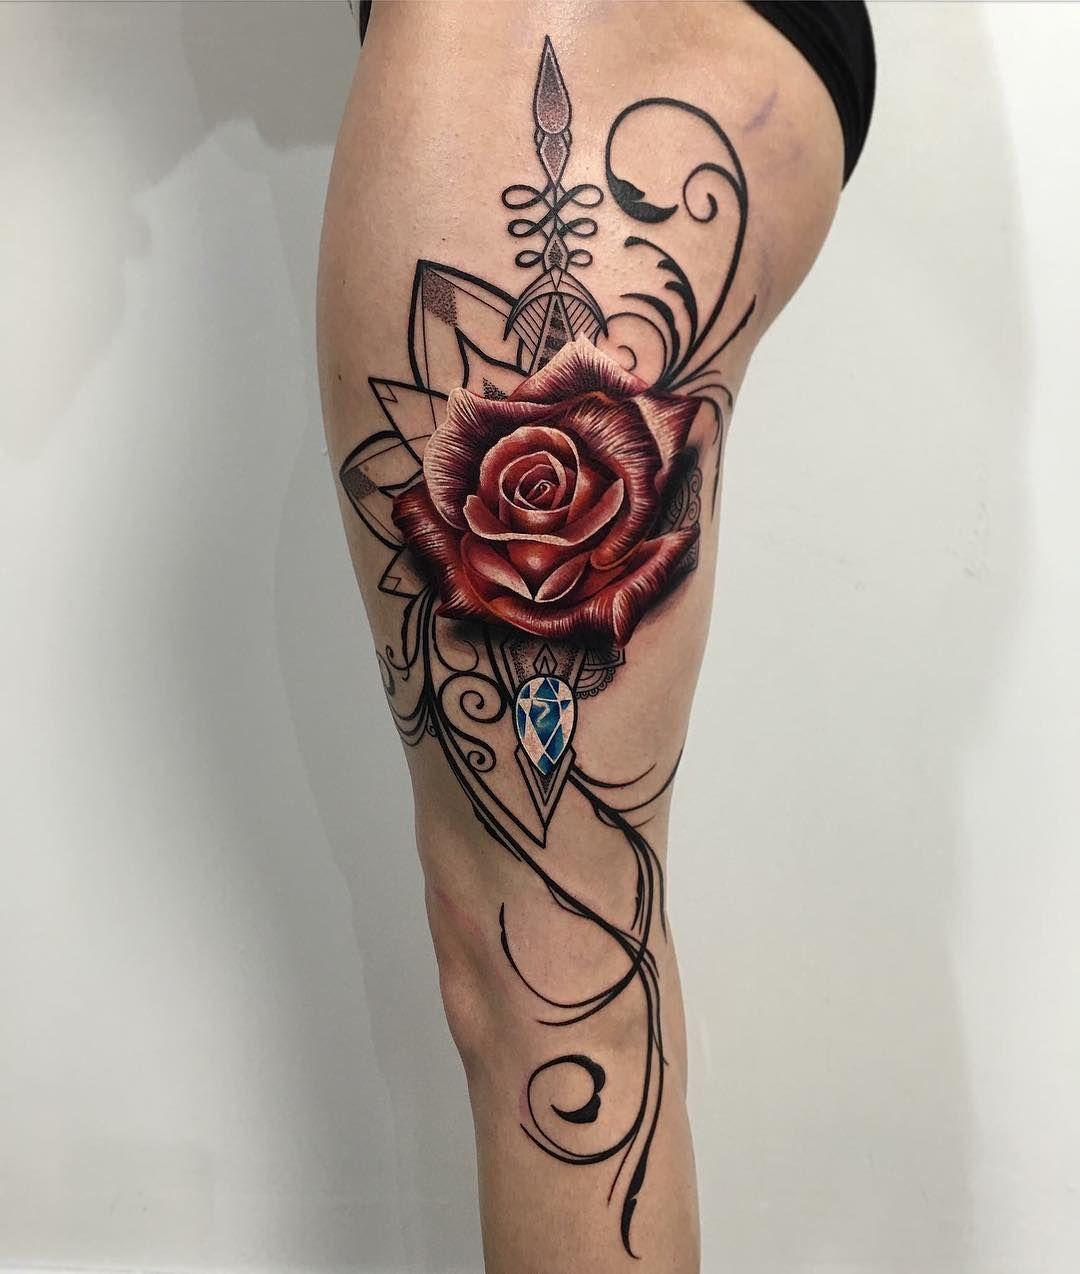 Single Rose Flower Tattoo Legs: Love This Rose Tattoo On Leg (mit Bildern)